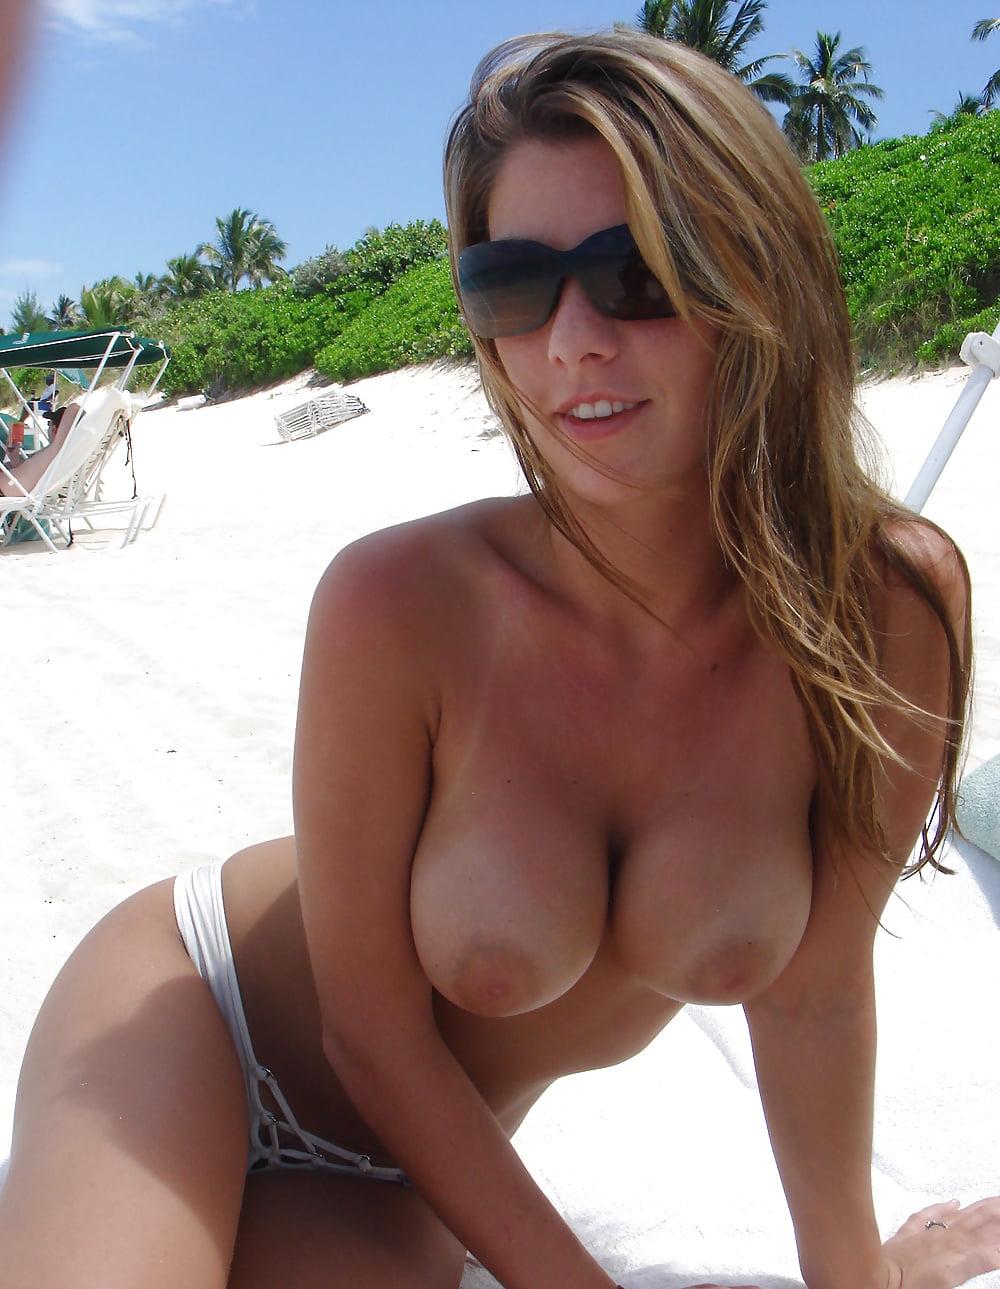 Hot topless milf — 11